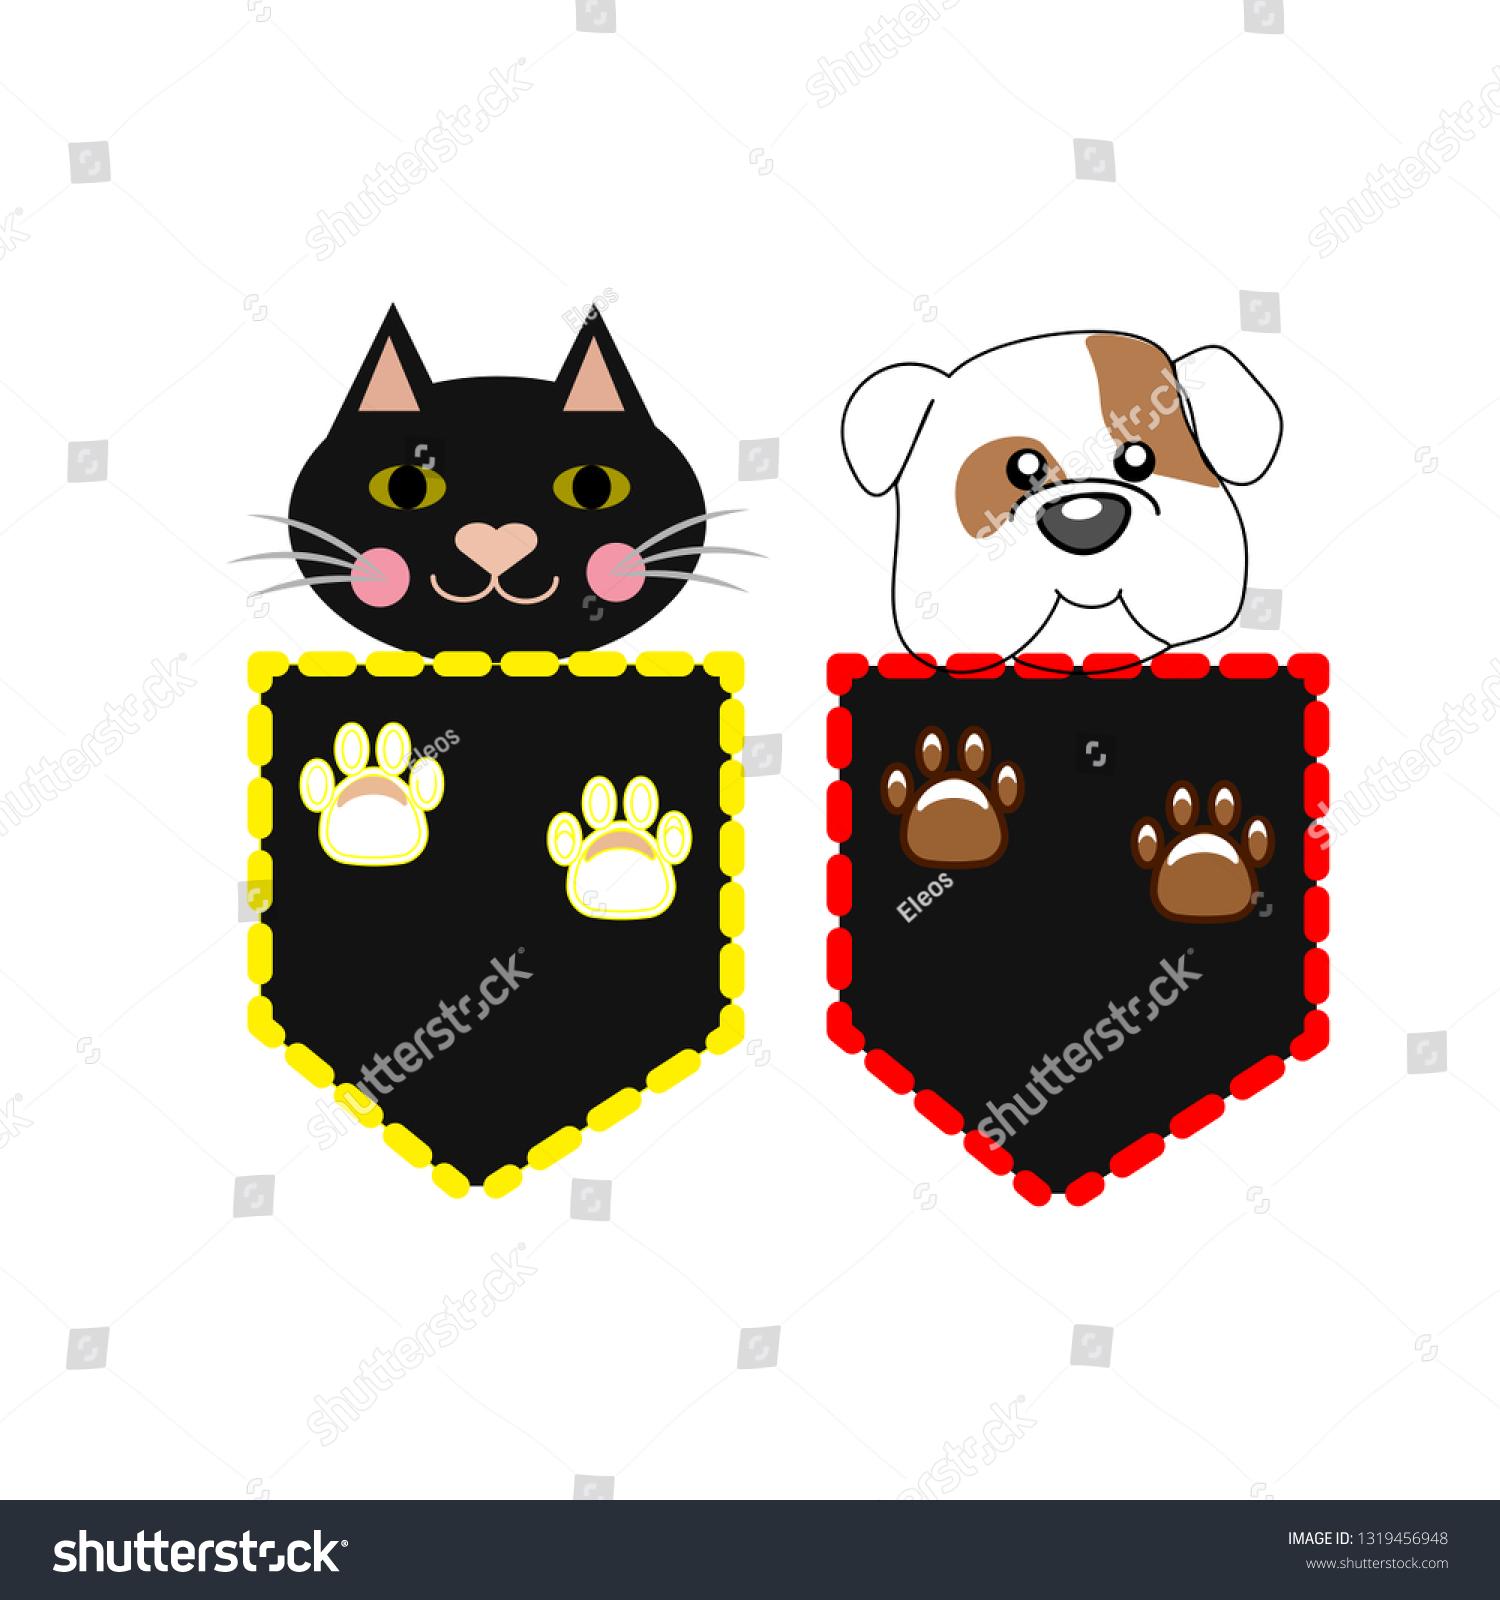 Cartoon Cat Dog Pocket Animal Collectionvector Stock Vector Royalty Free 1319456948